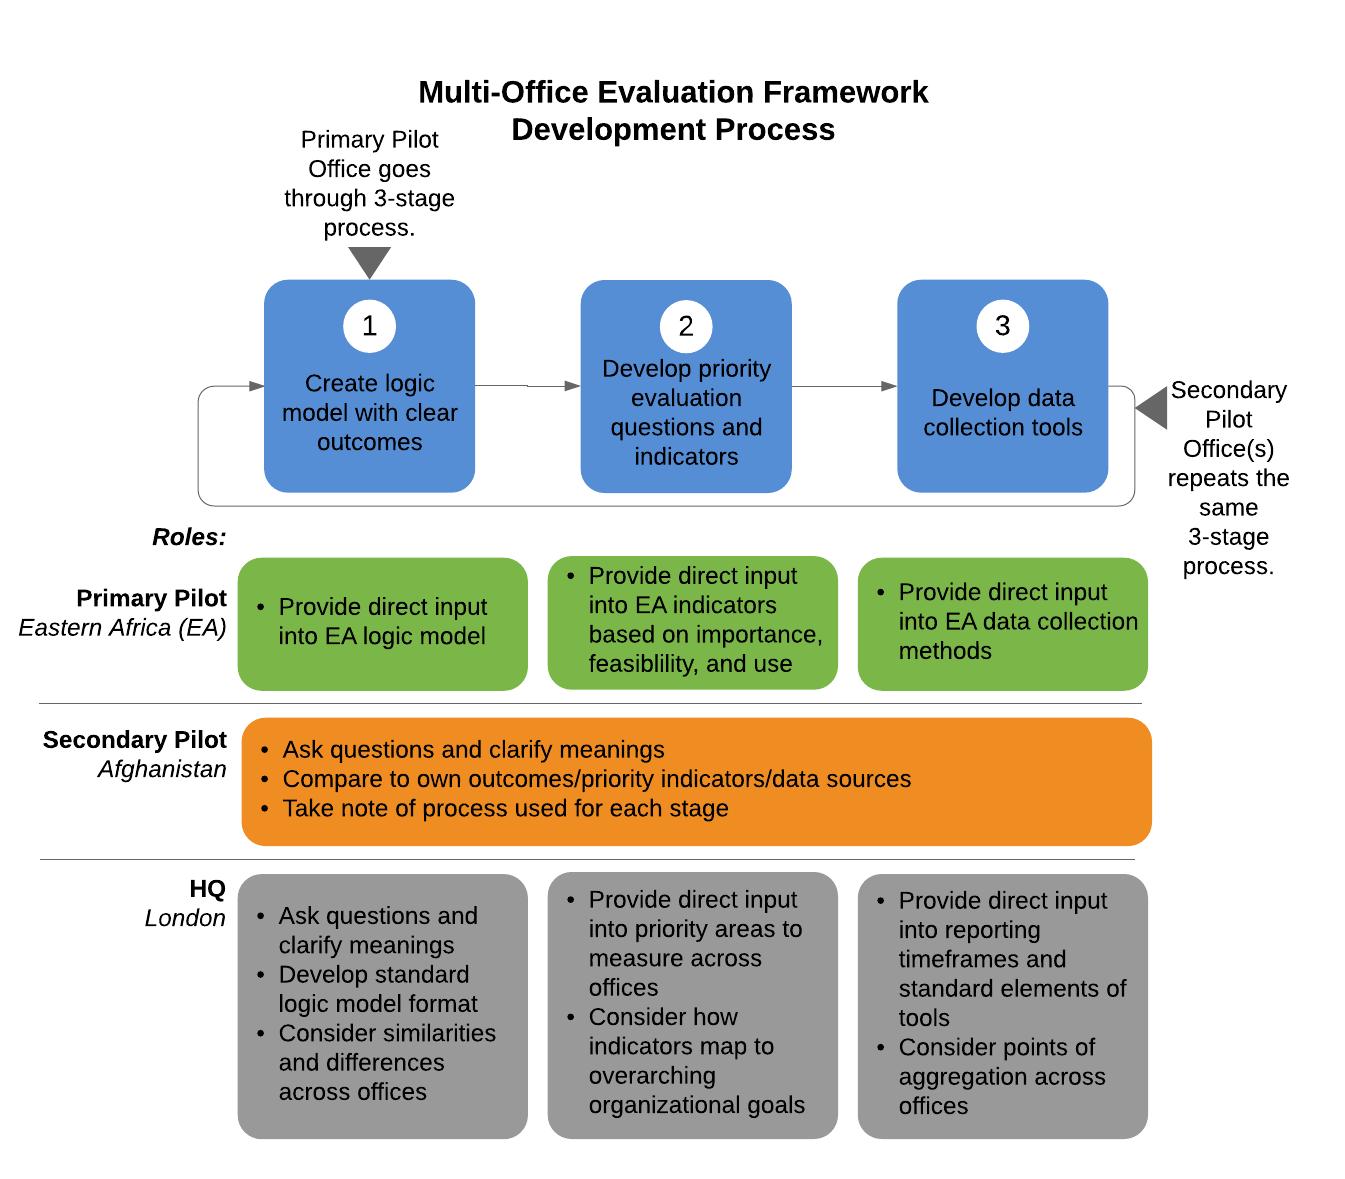 Multi-Office Evaluation Framework Development Process